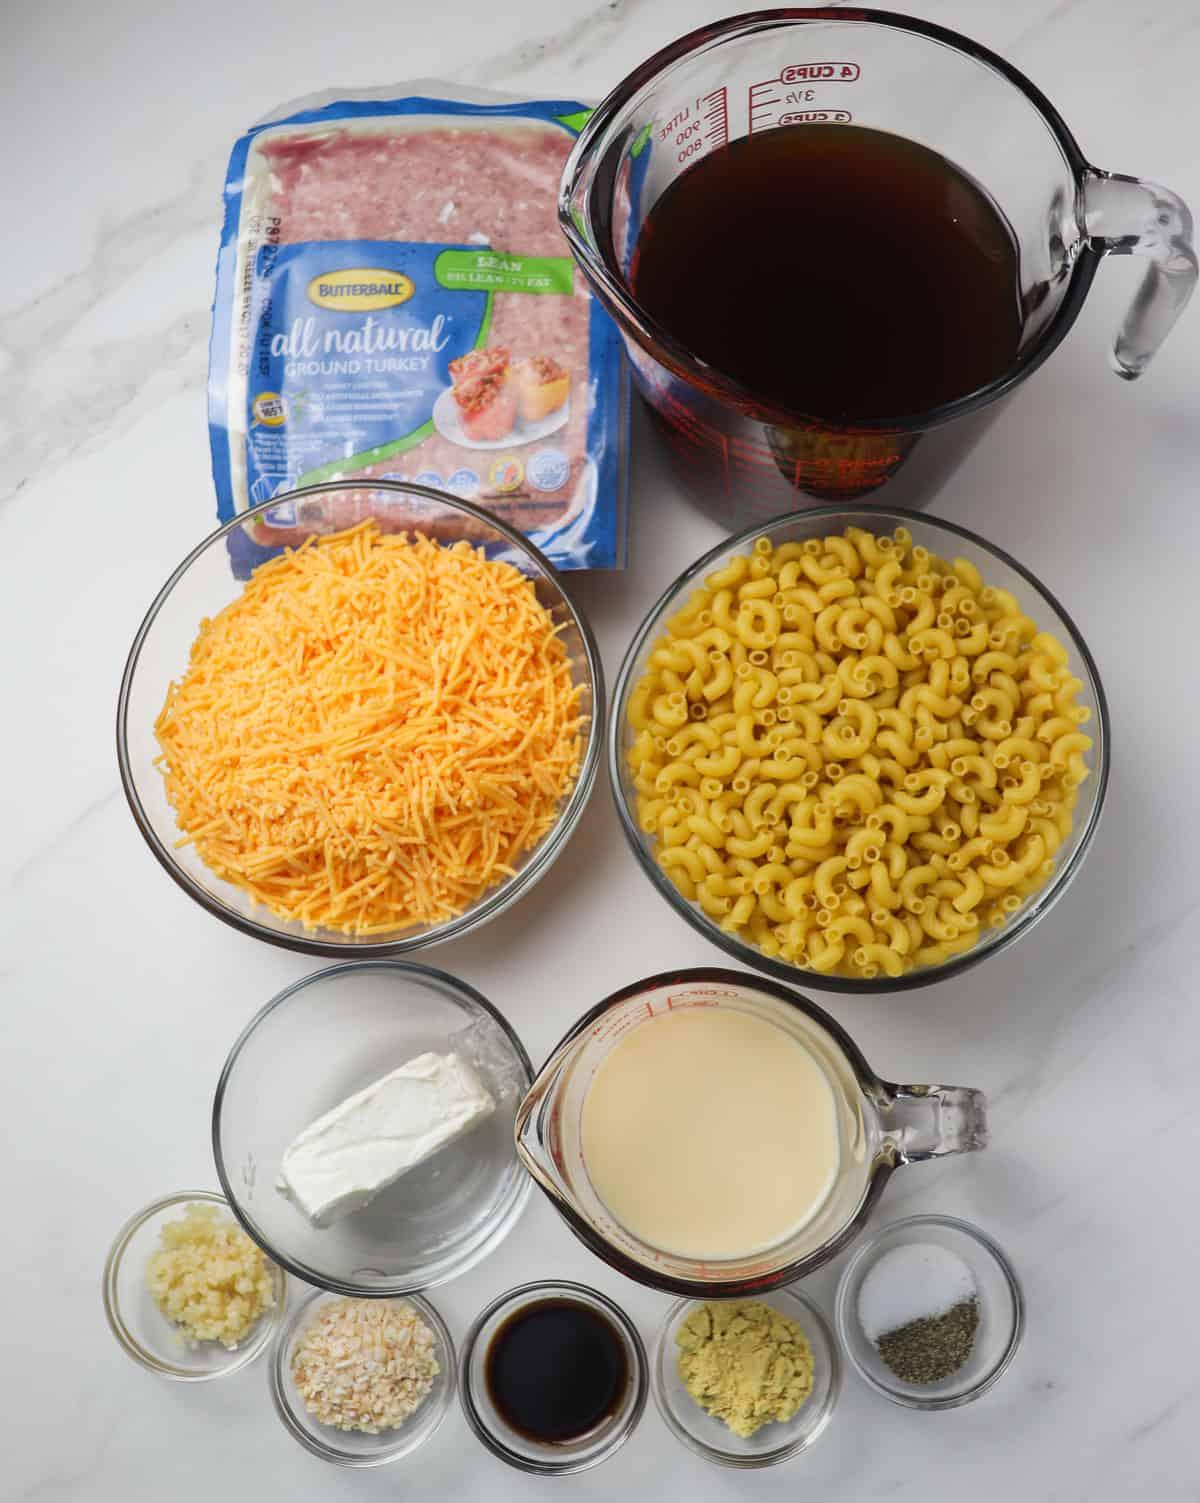 ingredients for instant pot hamburger helper